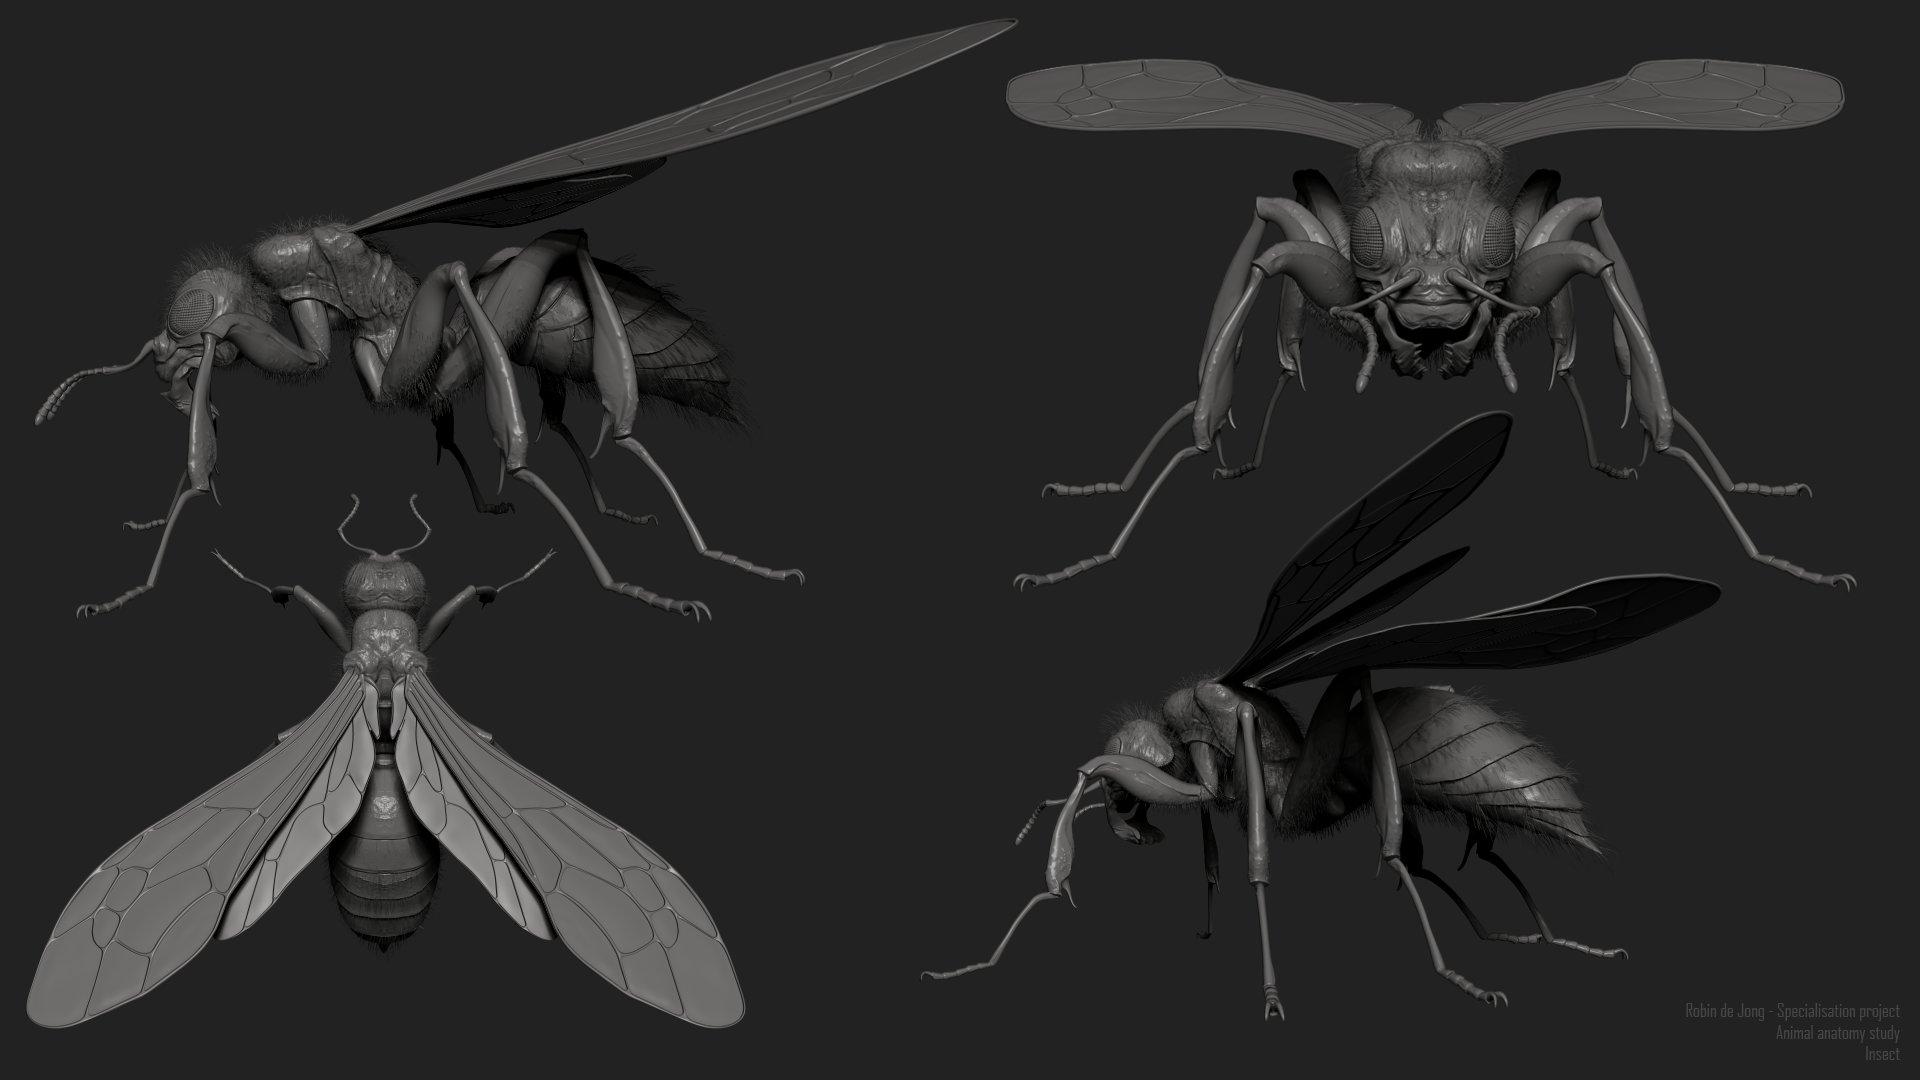 ArtStation - Insect research, Robin de Jong